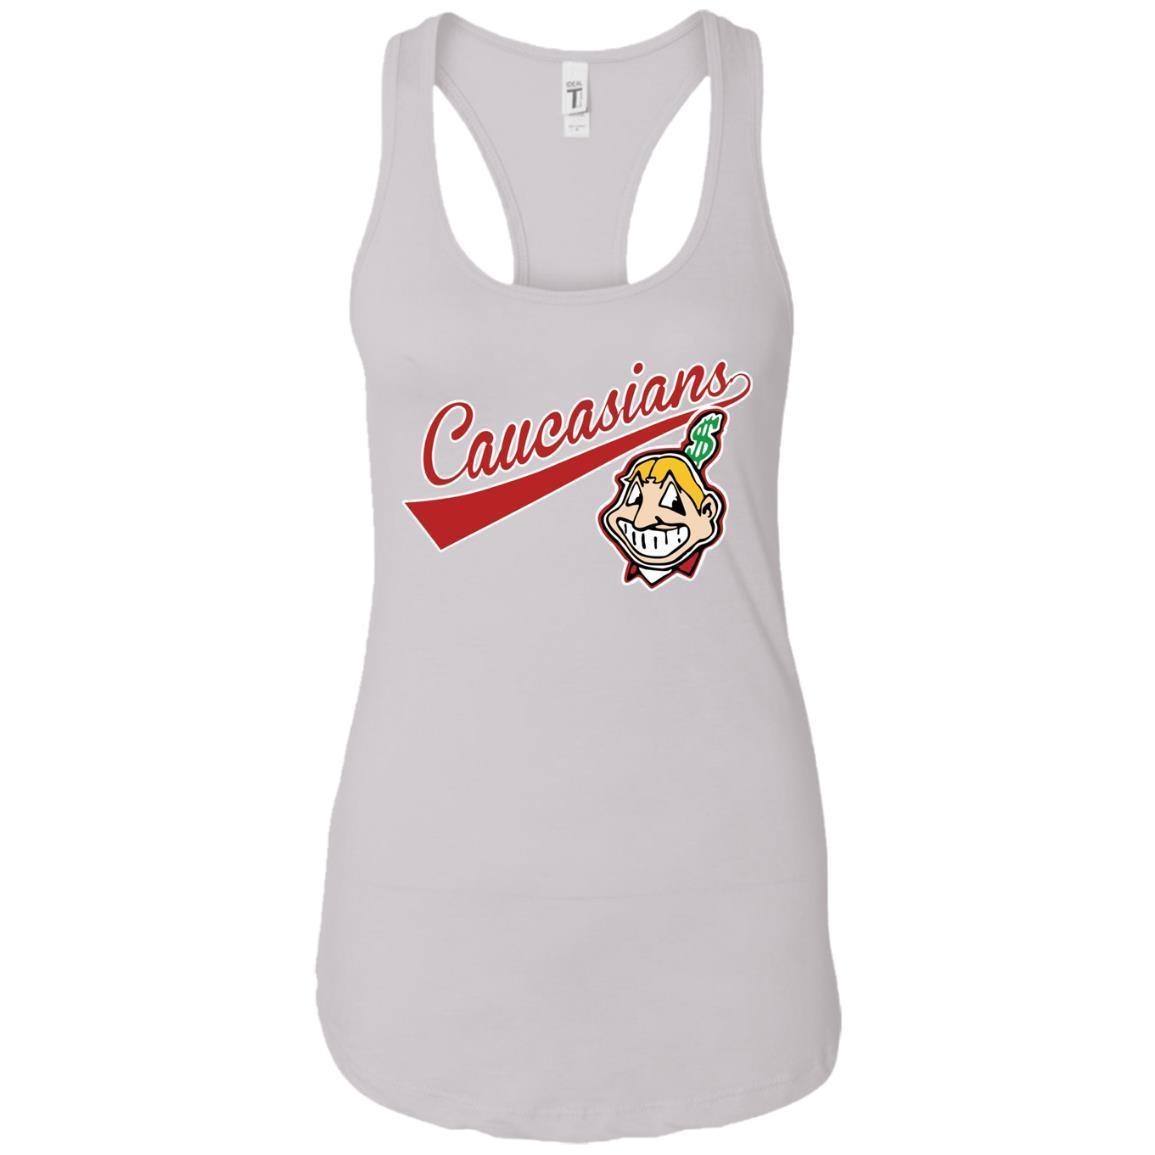 Cleveland Caucasians Native Go Indians – Ladies Ideal Racerback Tank